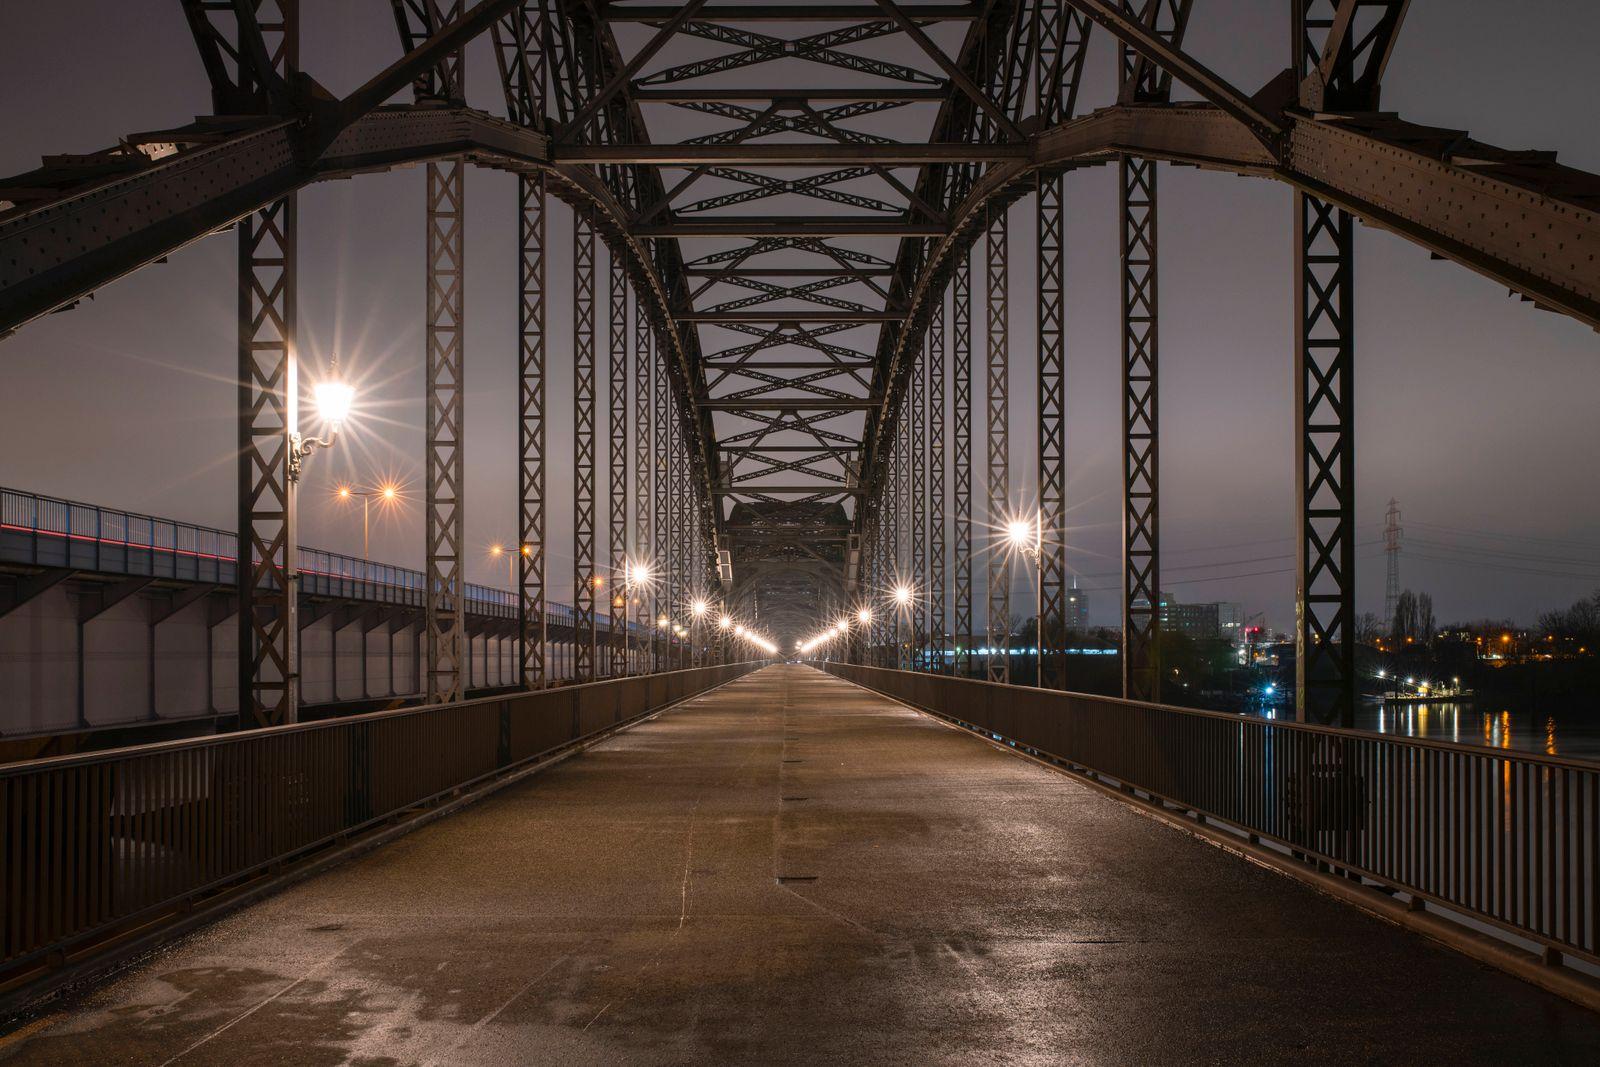 Germany, Hamburg, Diminishing perspective of Alte Harburger Elbbrucke bridge at night RJF00856